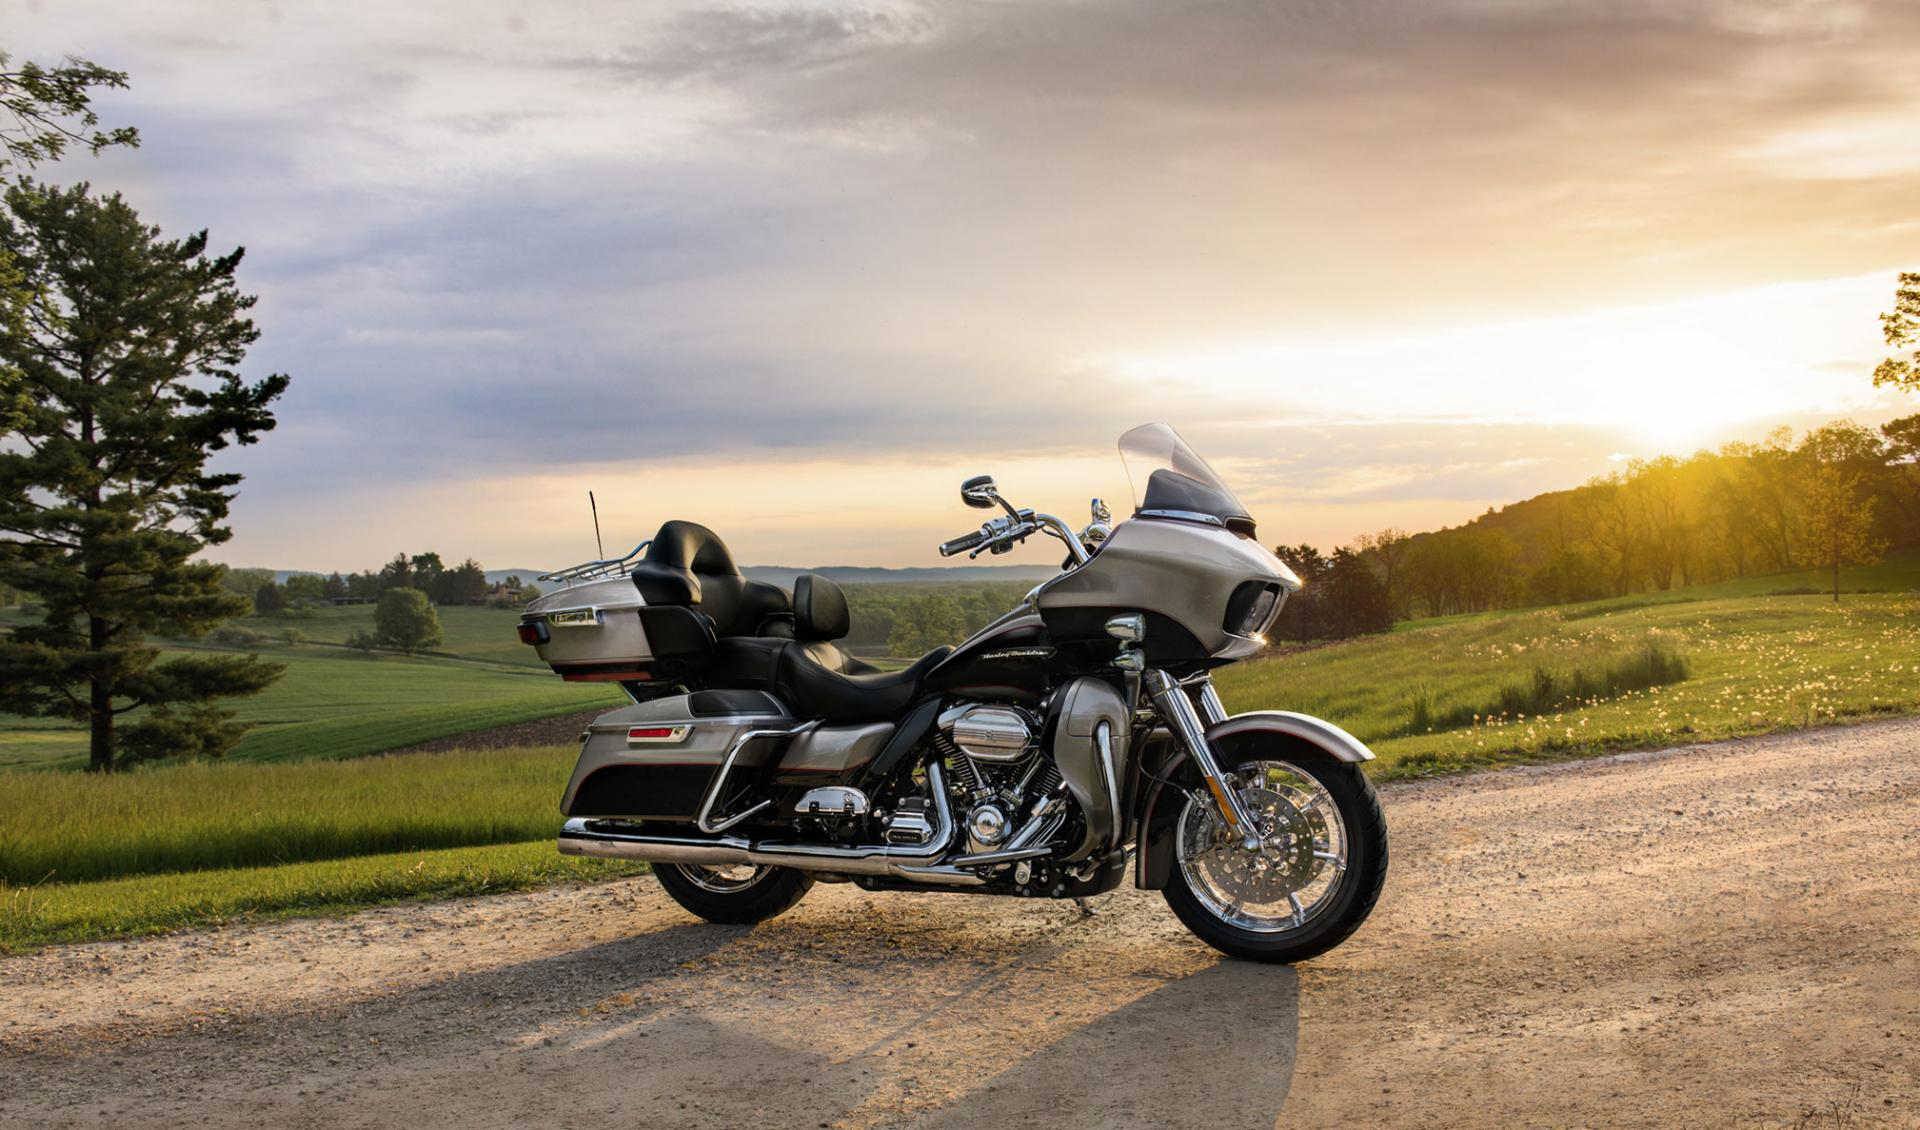 1996 Harley Road King >> Harley-Davidson Road Glide Wallpaper HD Download